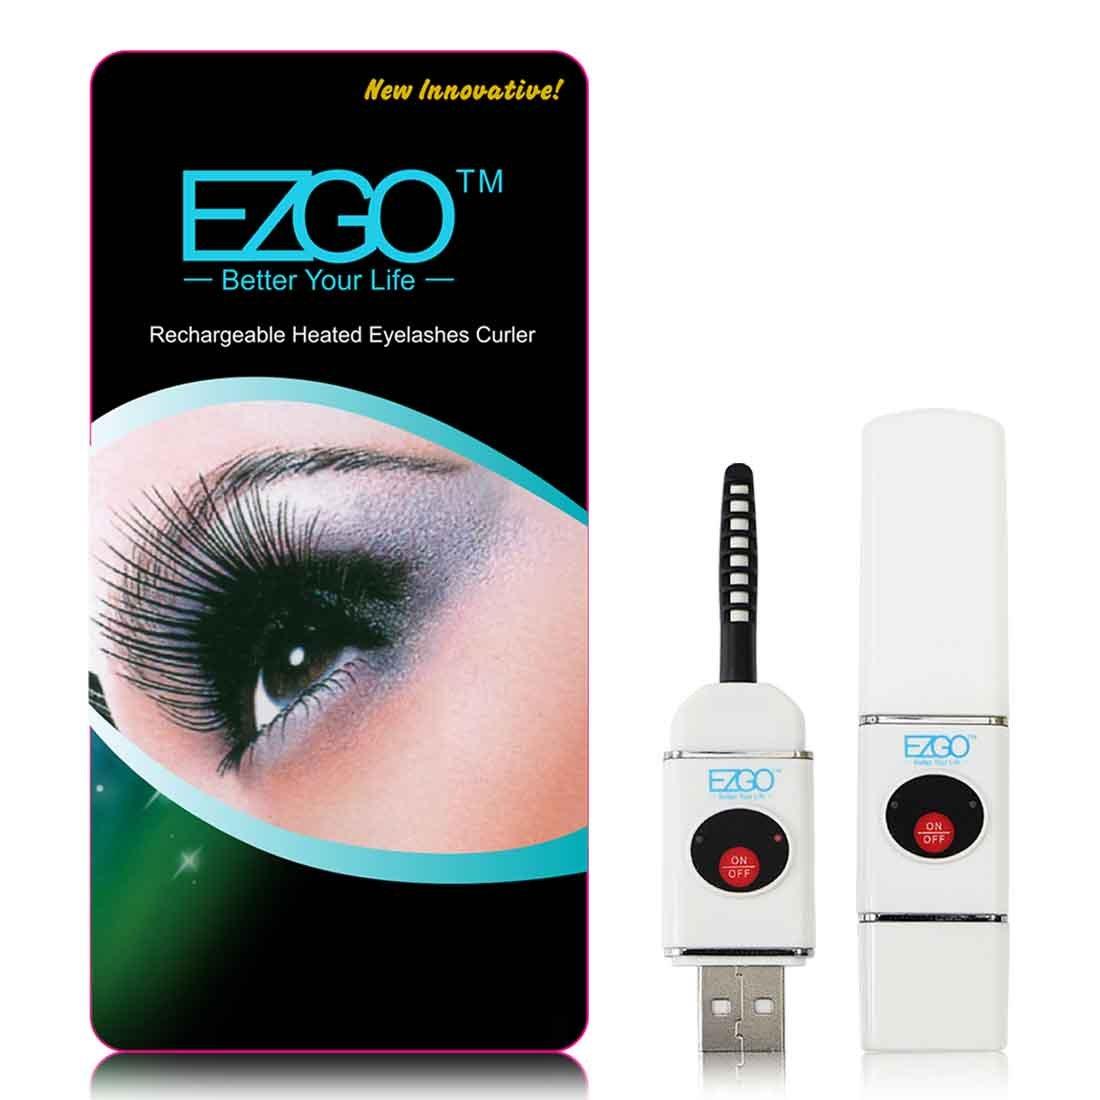 Ezgo Professional Usb Portable Eyelash Curlermini Rechargeable